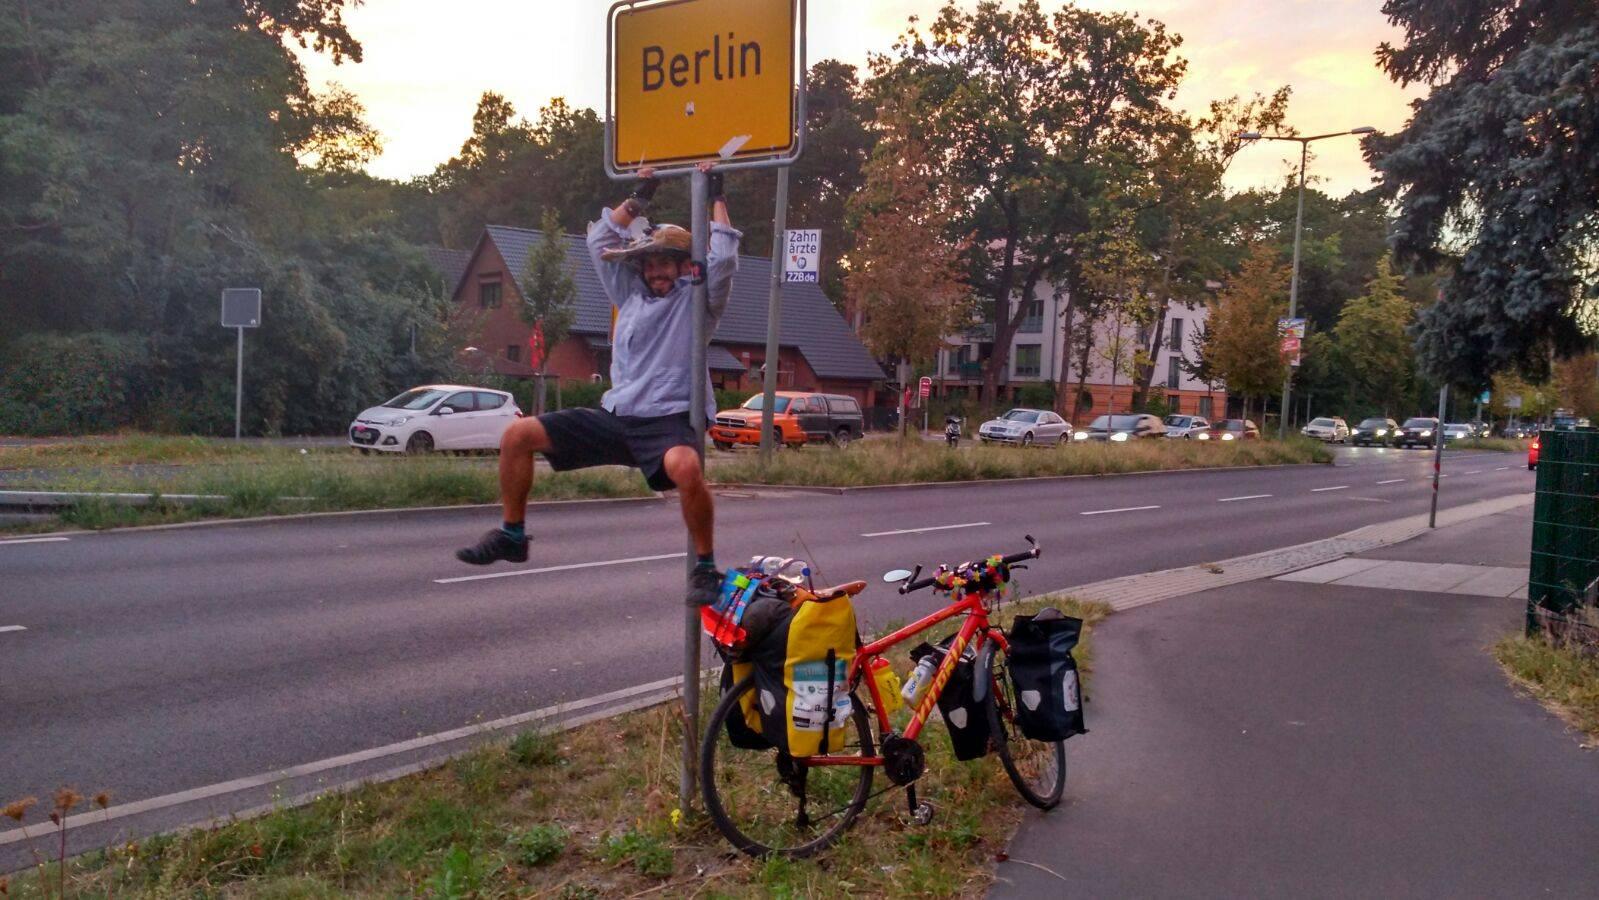 perle por el mundo etapa 53d - Perlé en Berlín. Etapa 53 de Perlé por el mundo